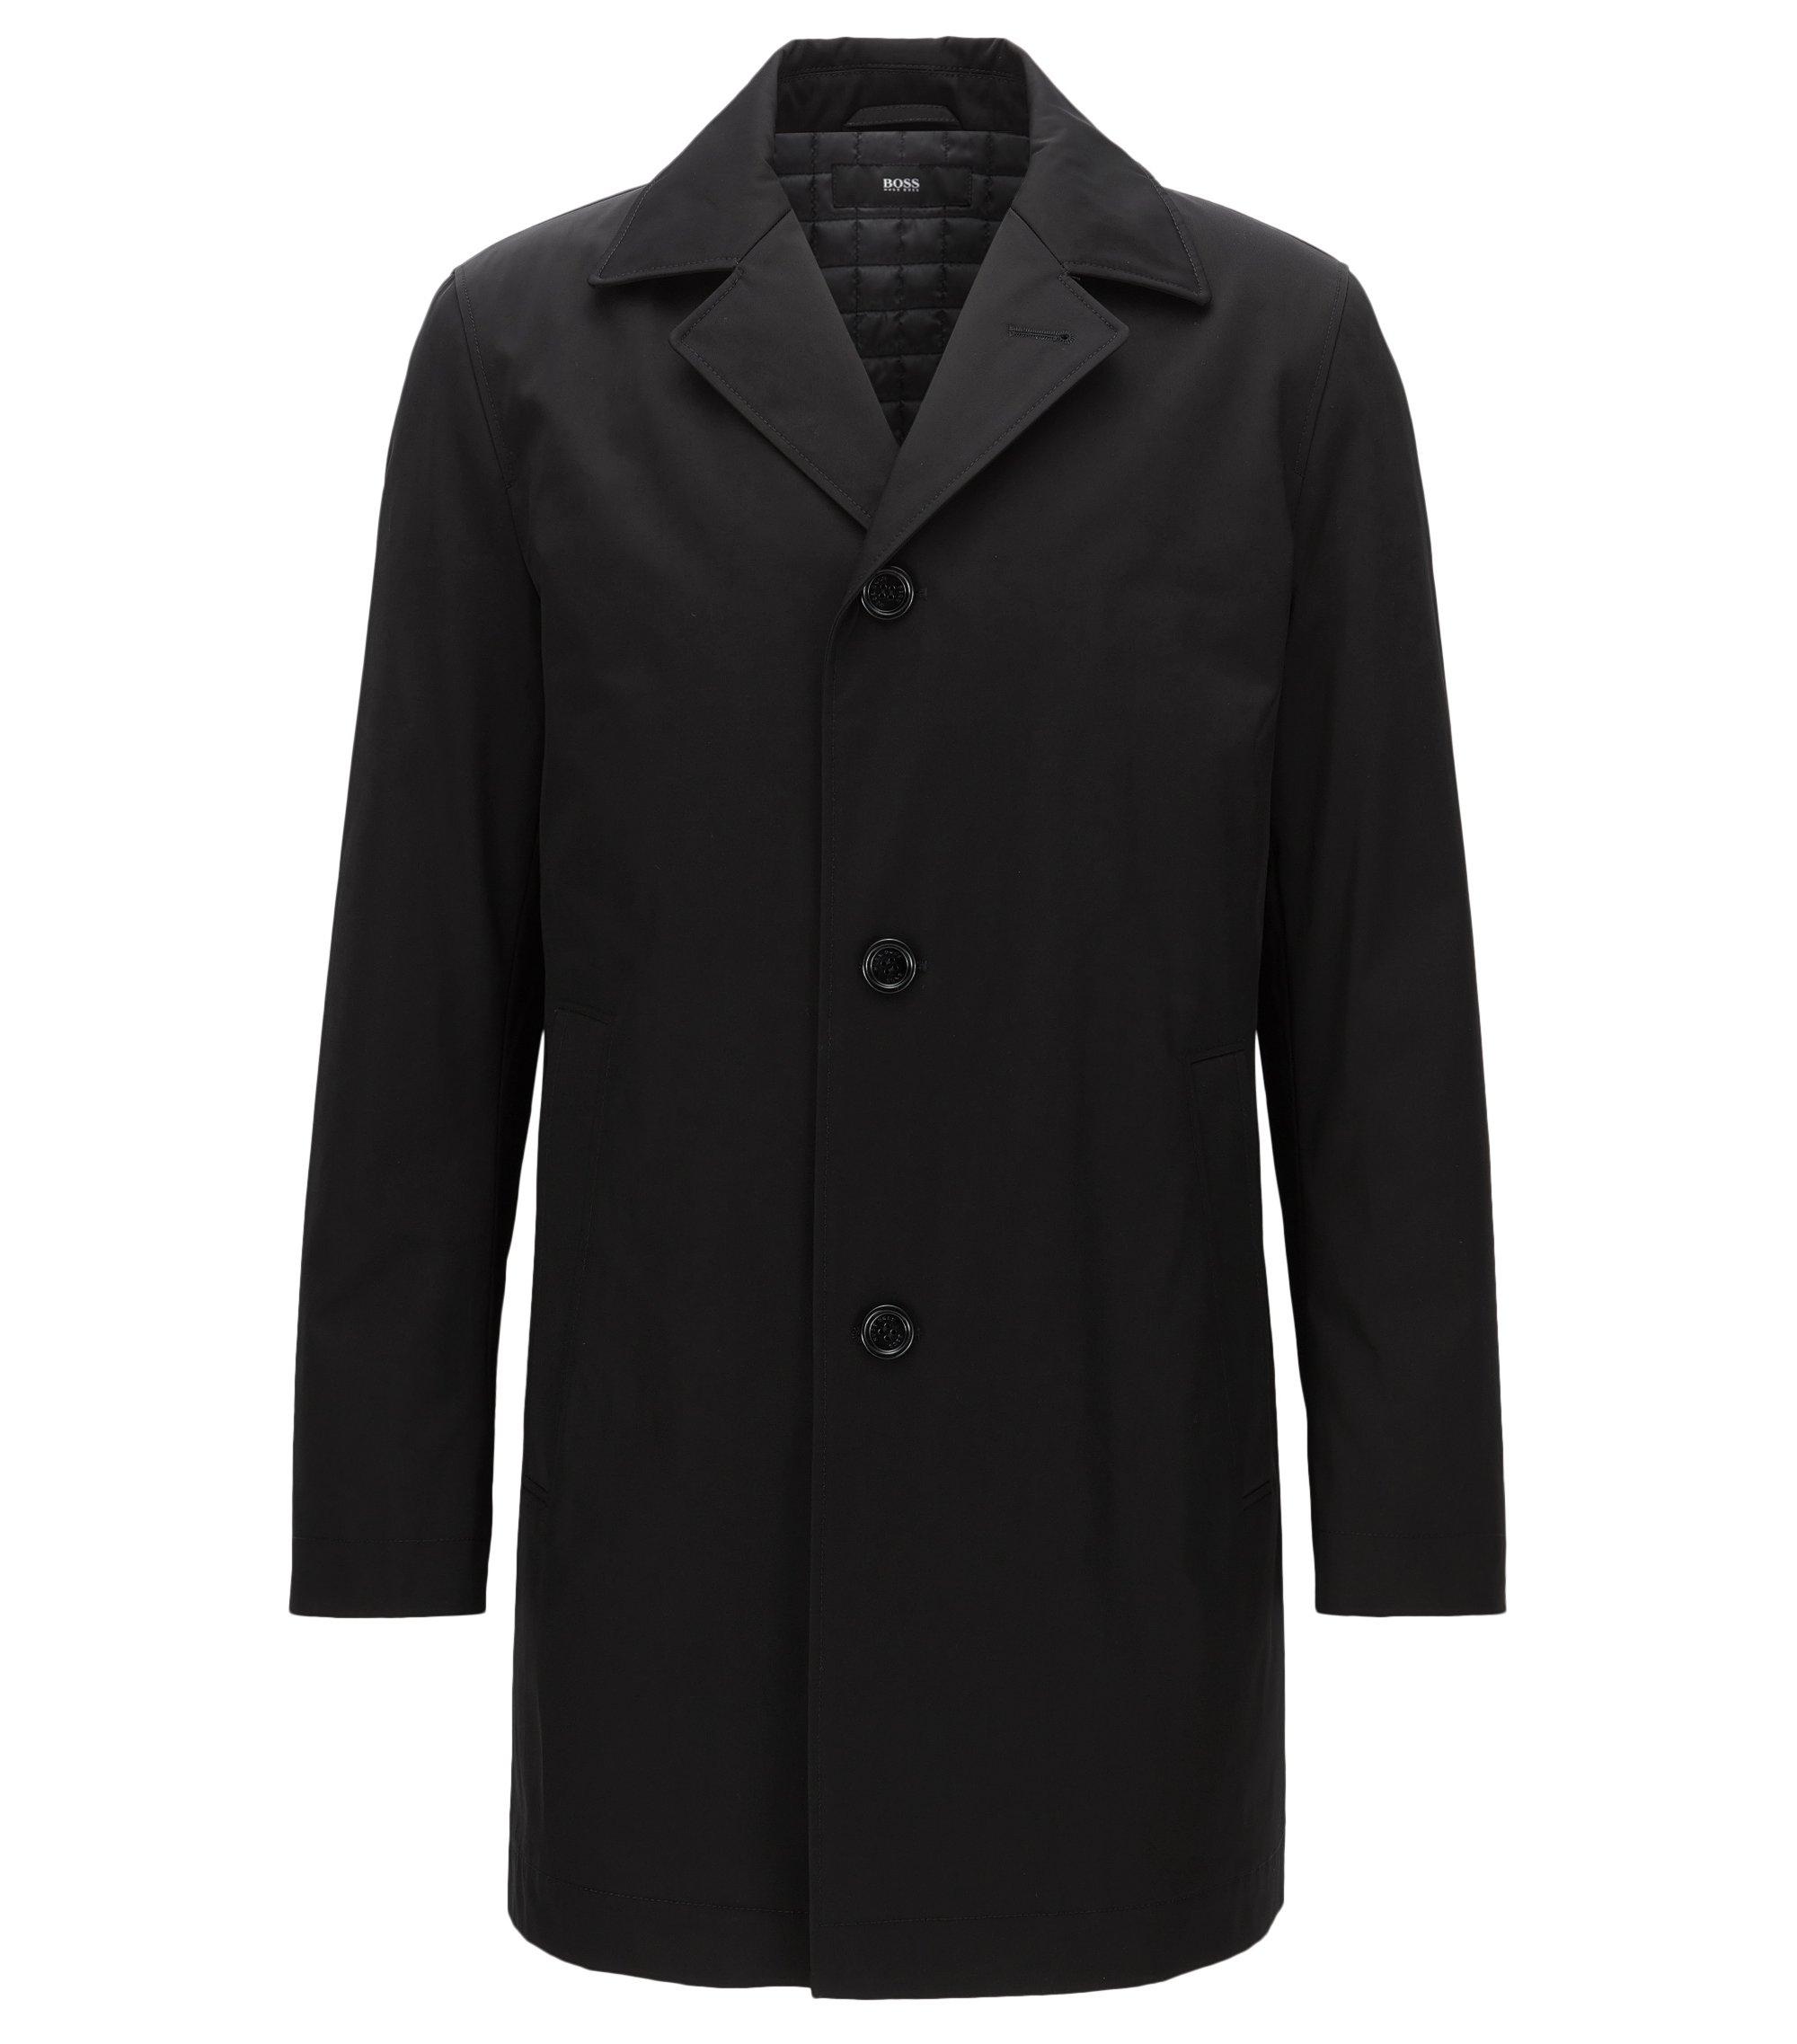 Abrigo ligeramente acolchado en tejido de peso medio, Negro